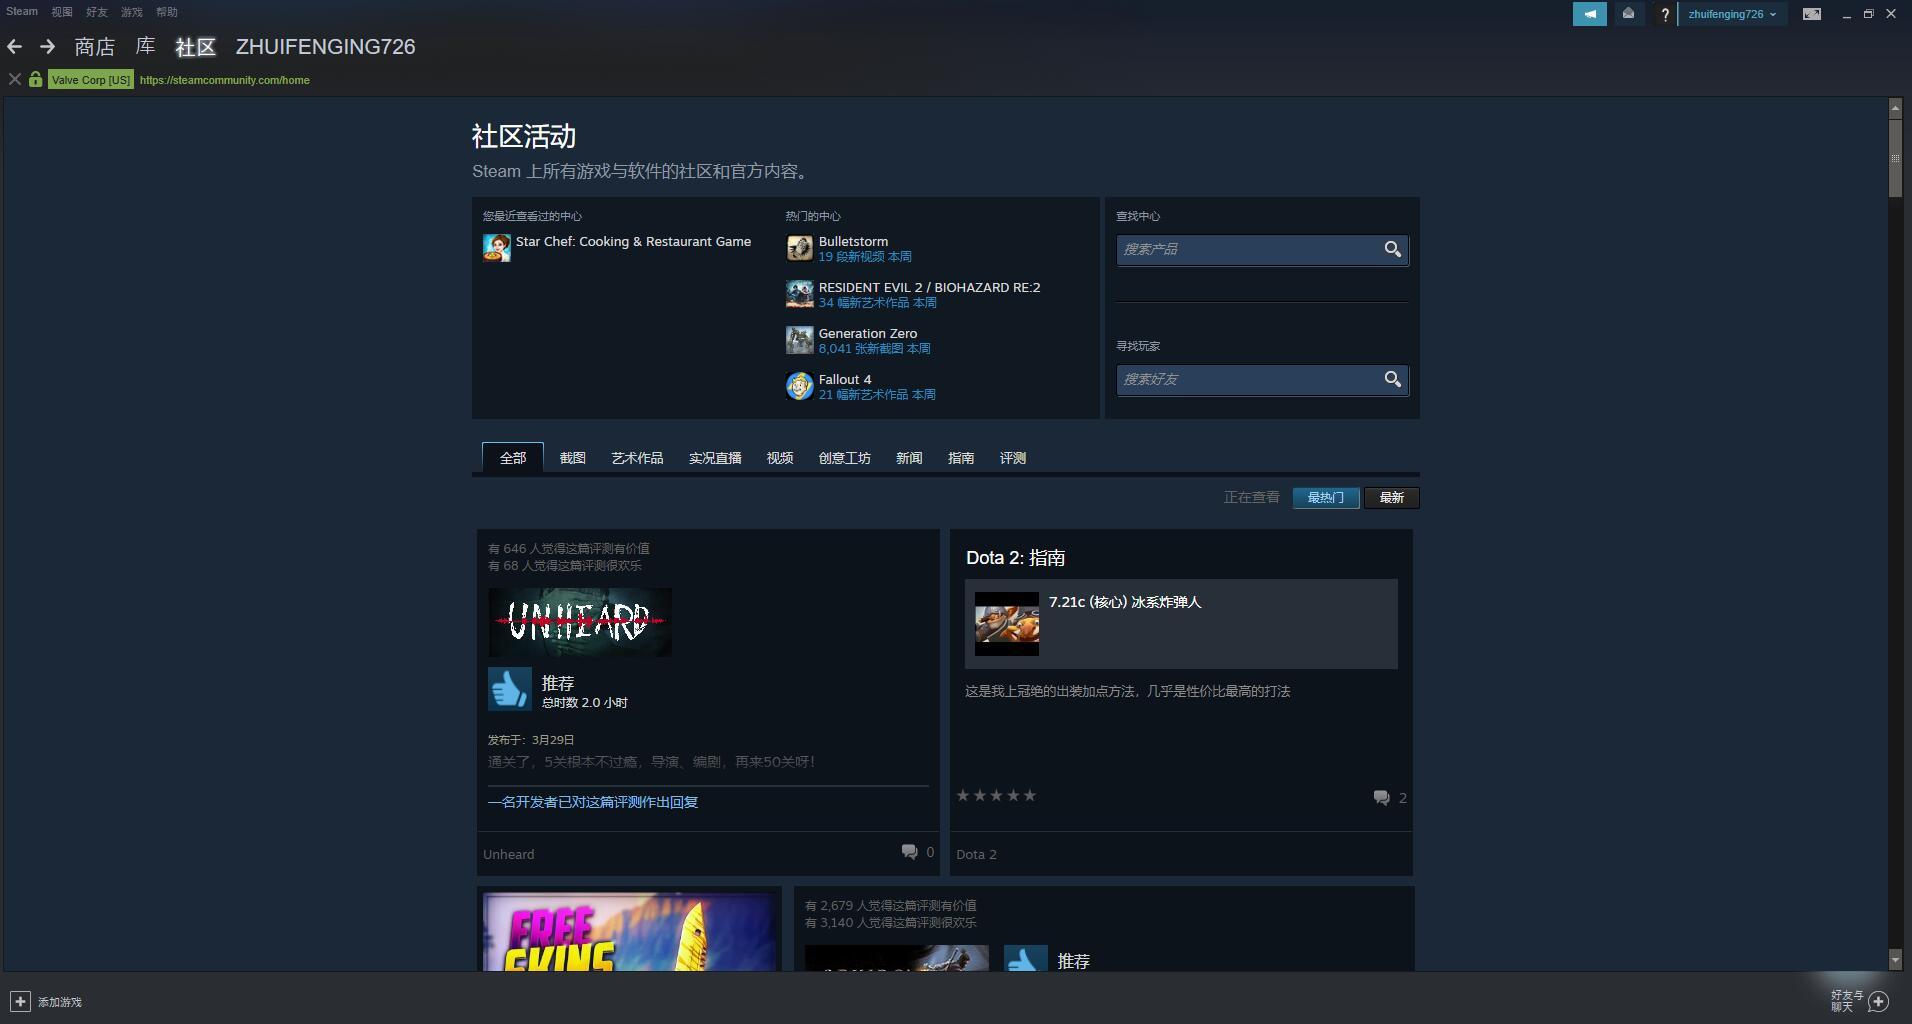 Steam社区正常显示图片示例